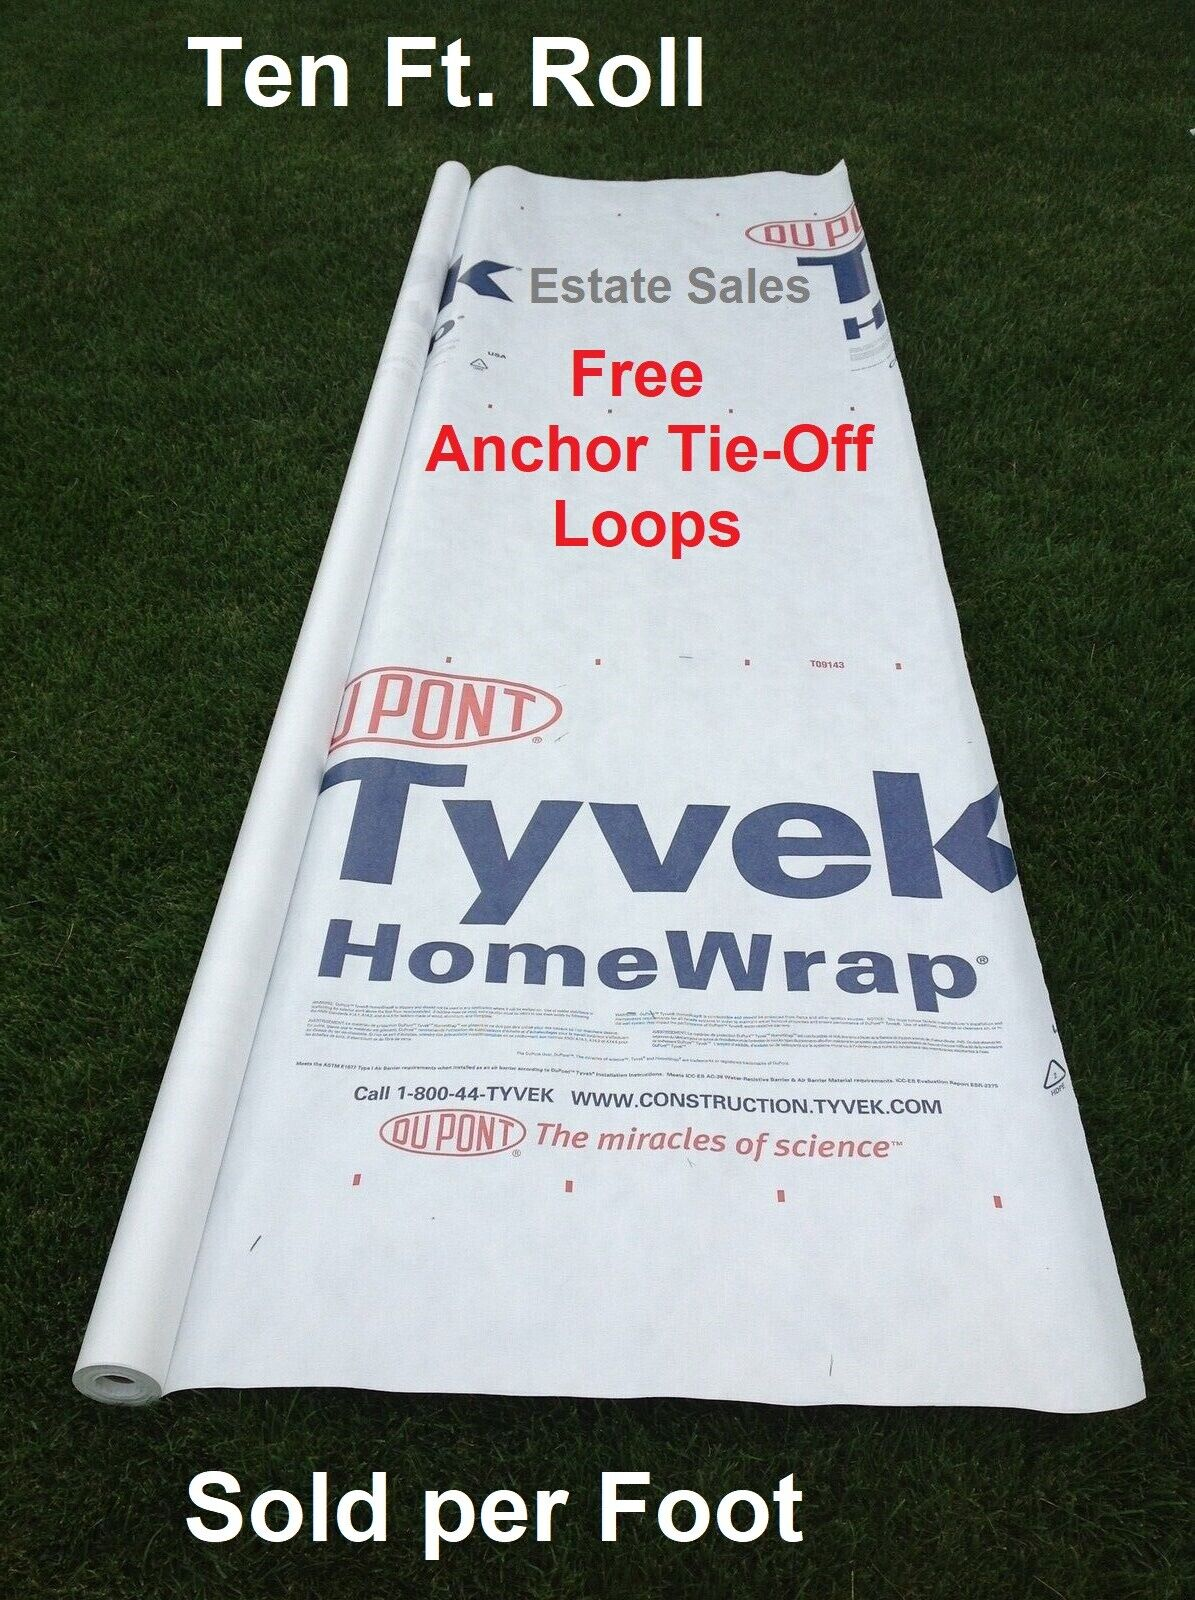 10' Tyvek Homewrap Groundcloth Tarp Hiking Camping Tent